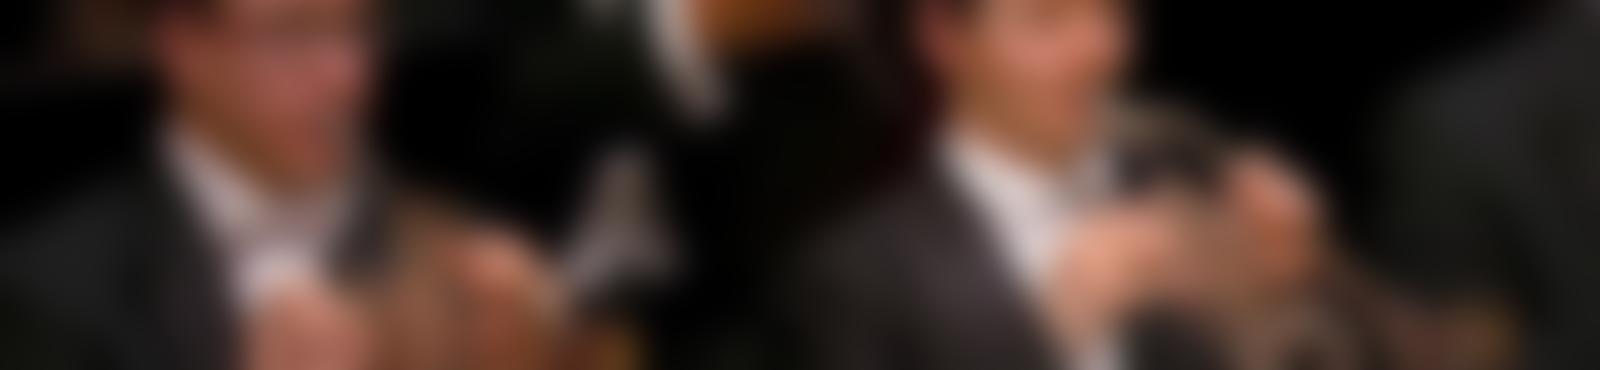 Blurred 0c858b34 0c36 4a78 af02 7c6fc590c381